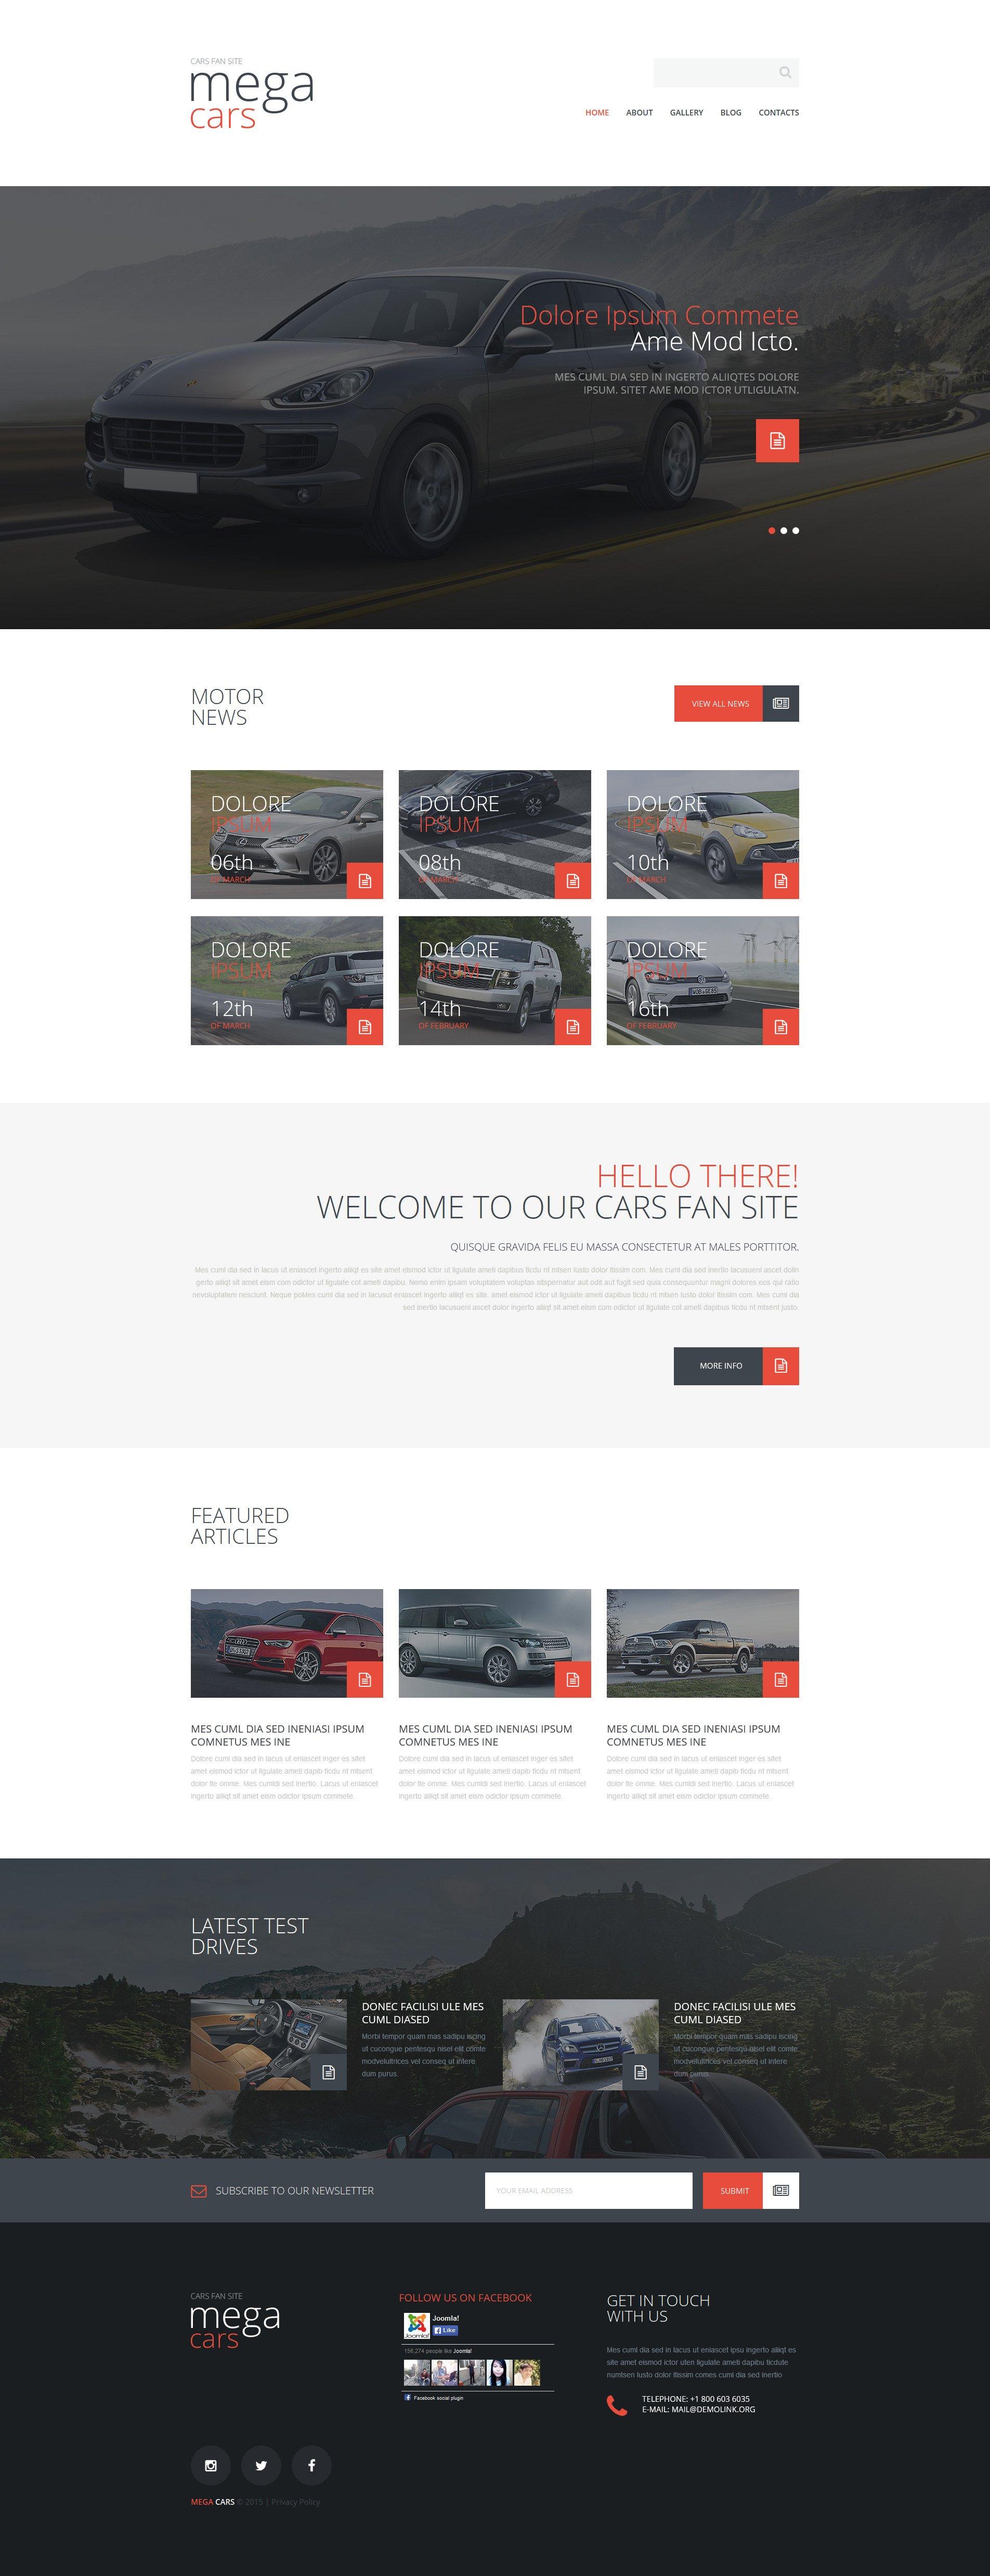 Cars Fan Site Joomla Template